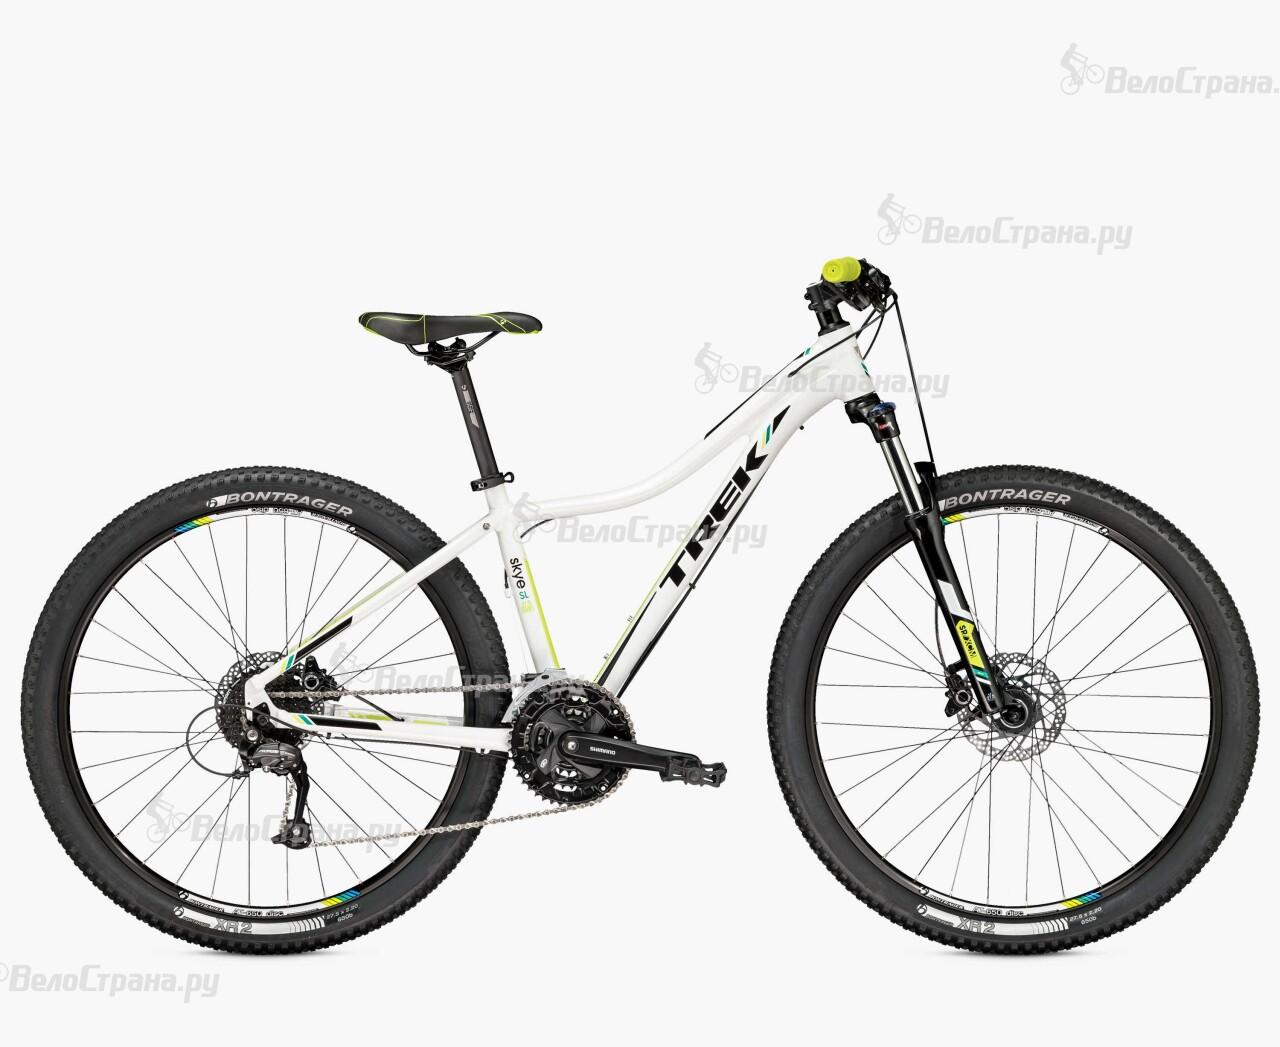 все цены на Велосипед Trek Skye SL 29 (2016) онлайн